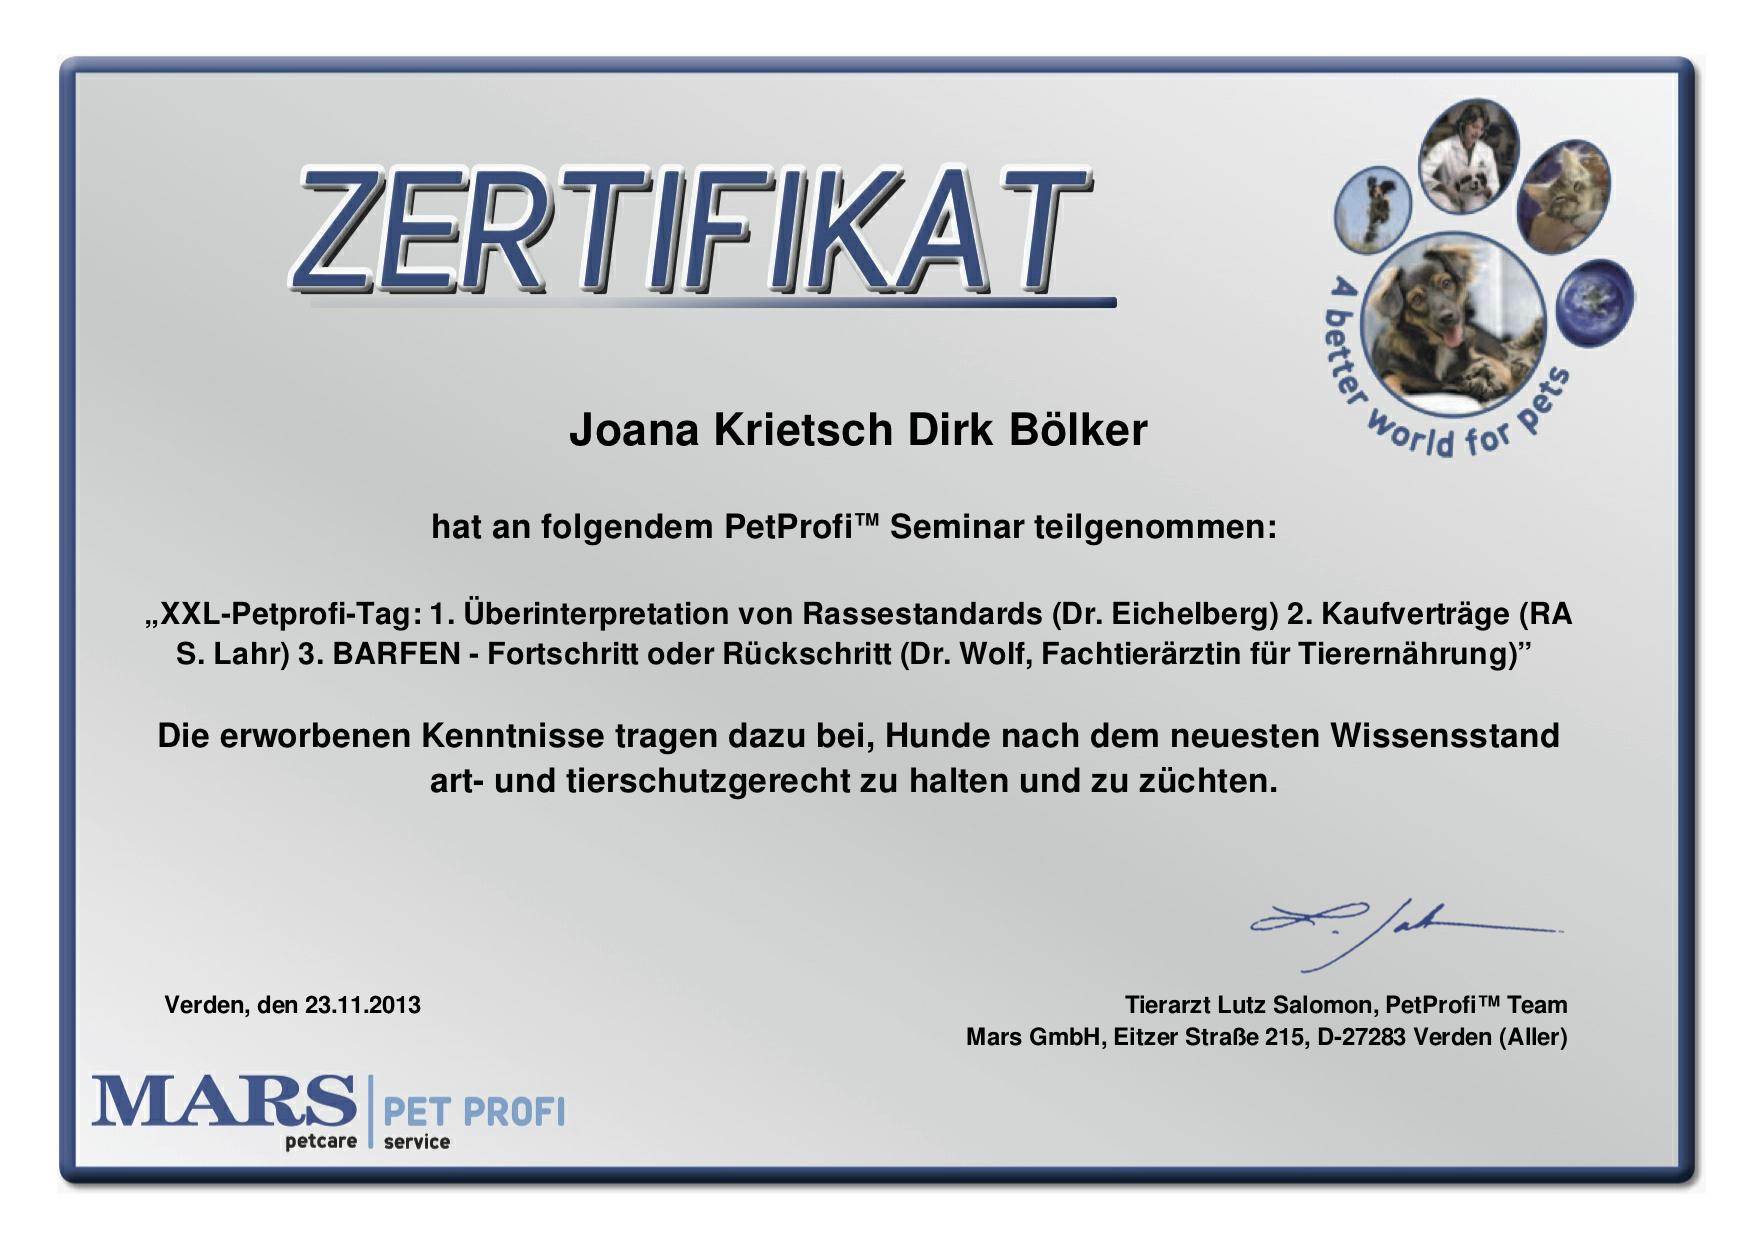 20180605-124918_Zertifikat